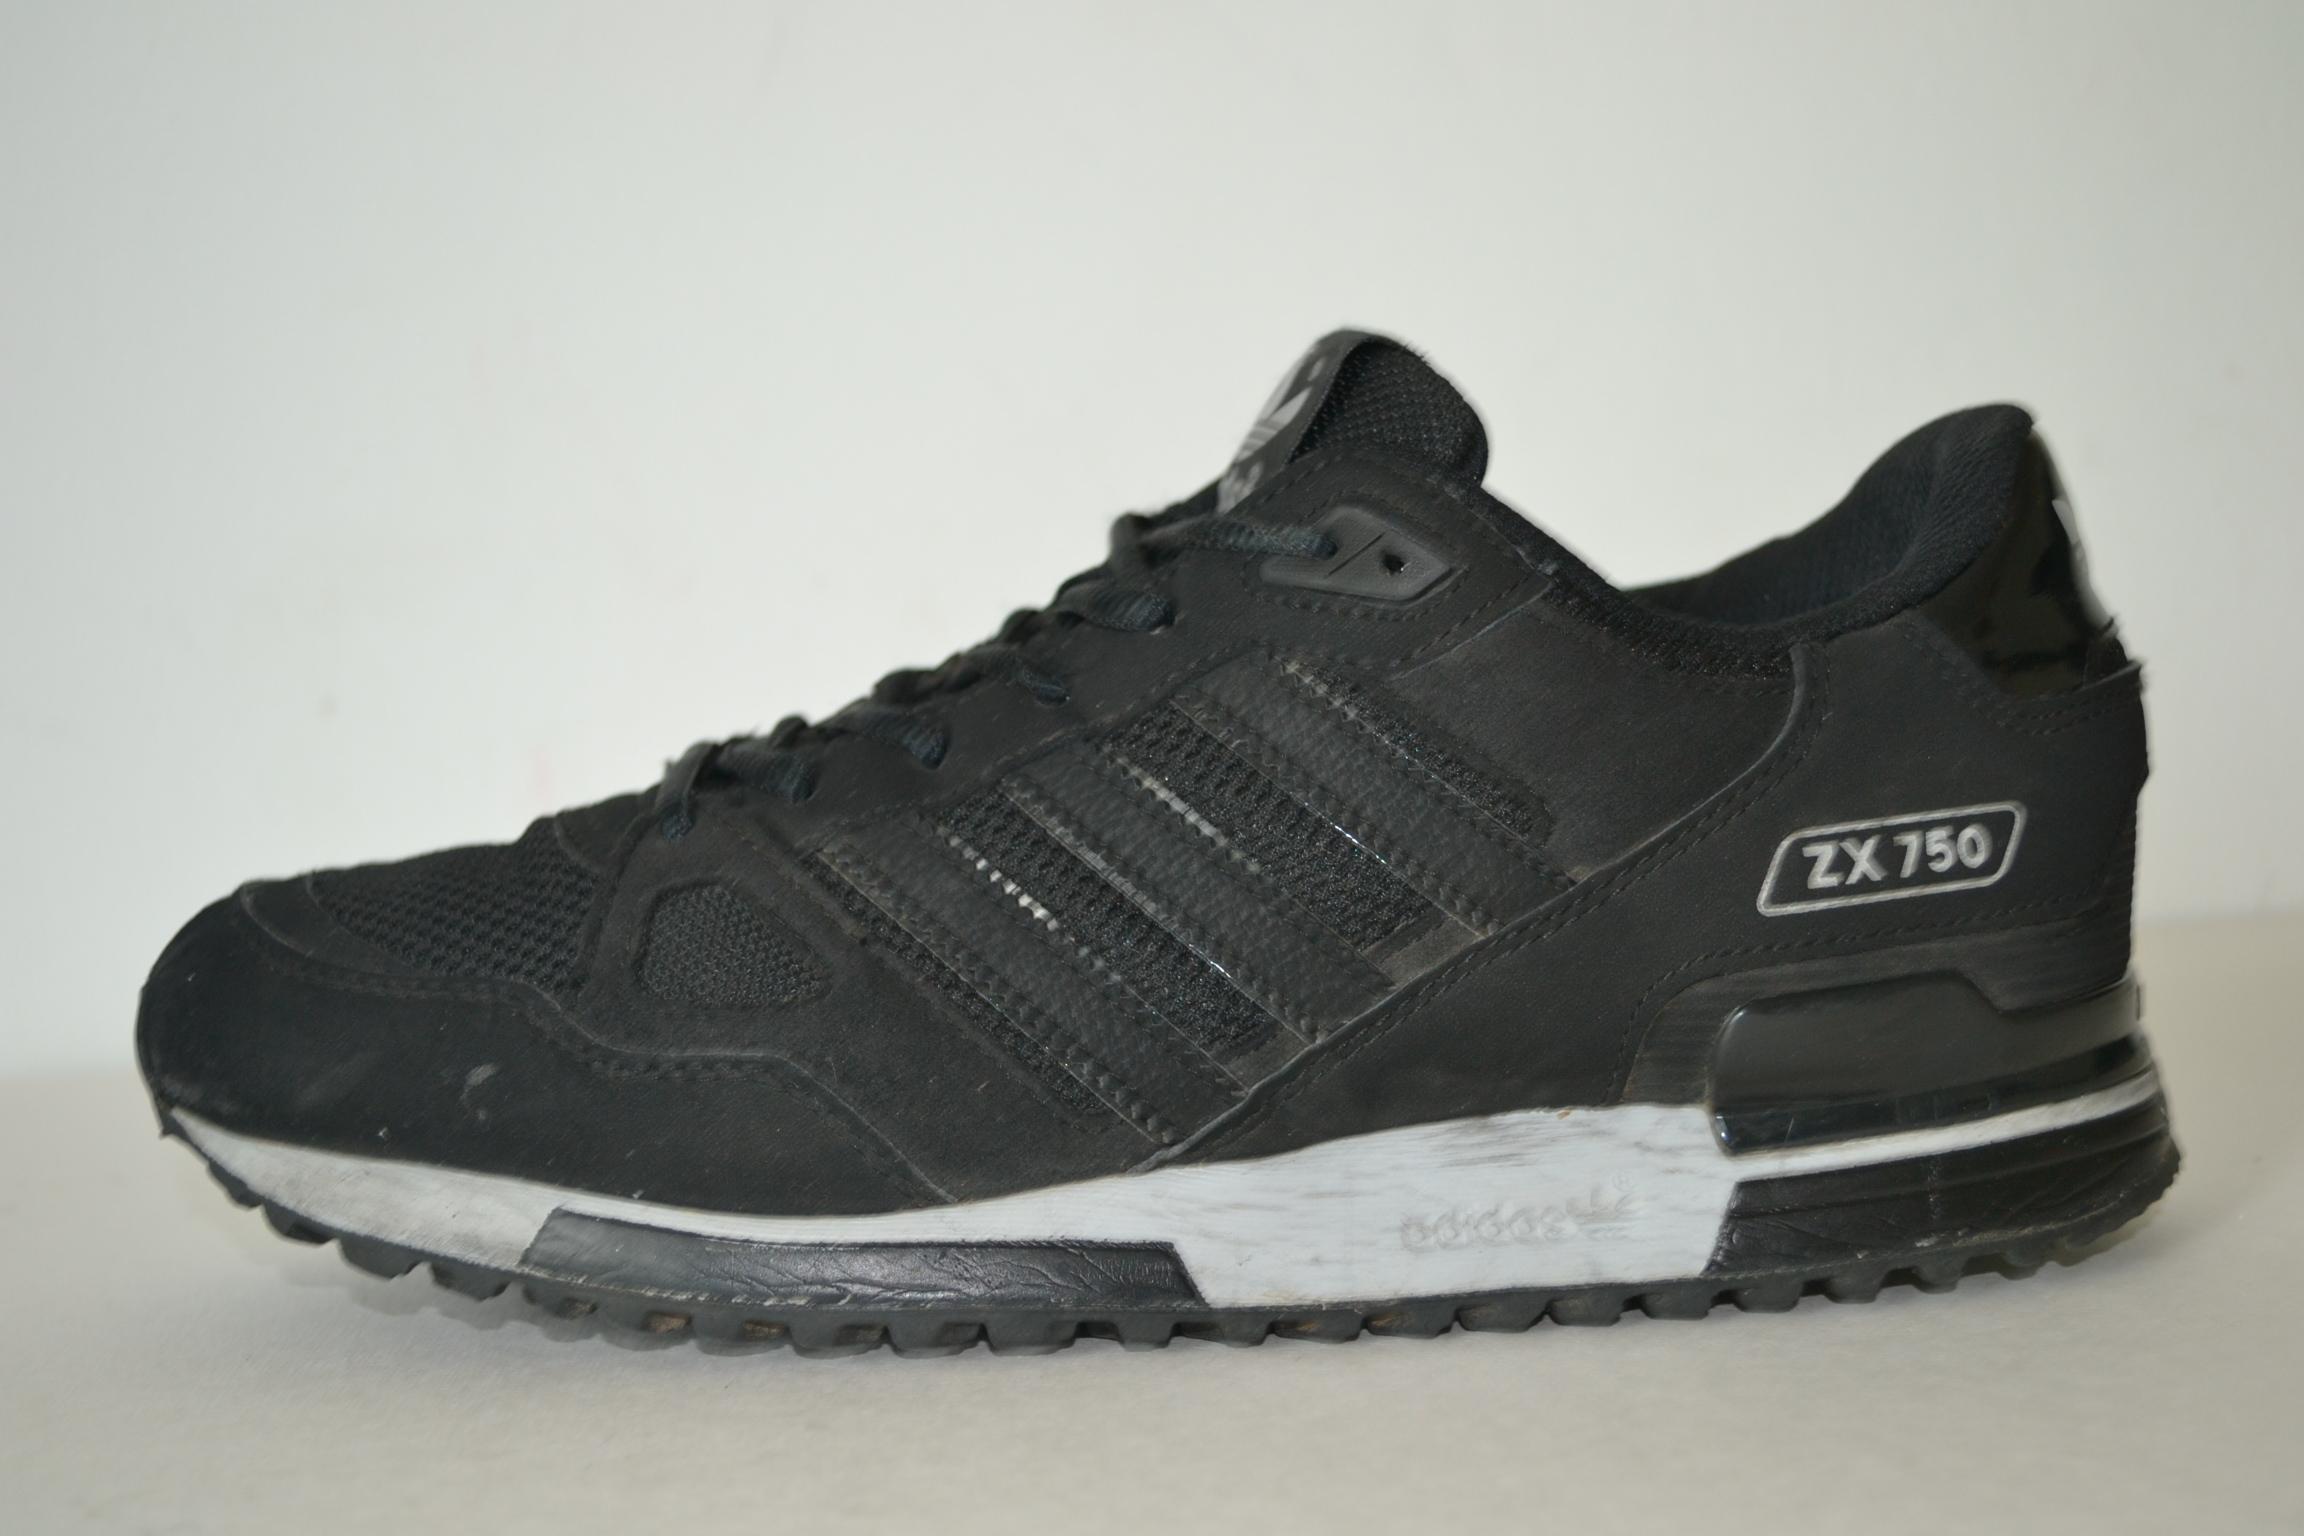 1b53e3e19ba7d ... wholesale buty adidas zx 750 rozmiar 42 1193b 32936